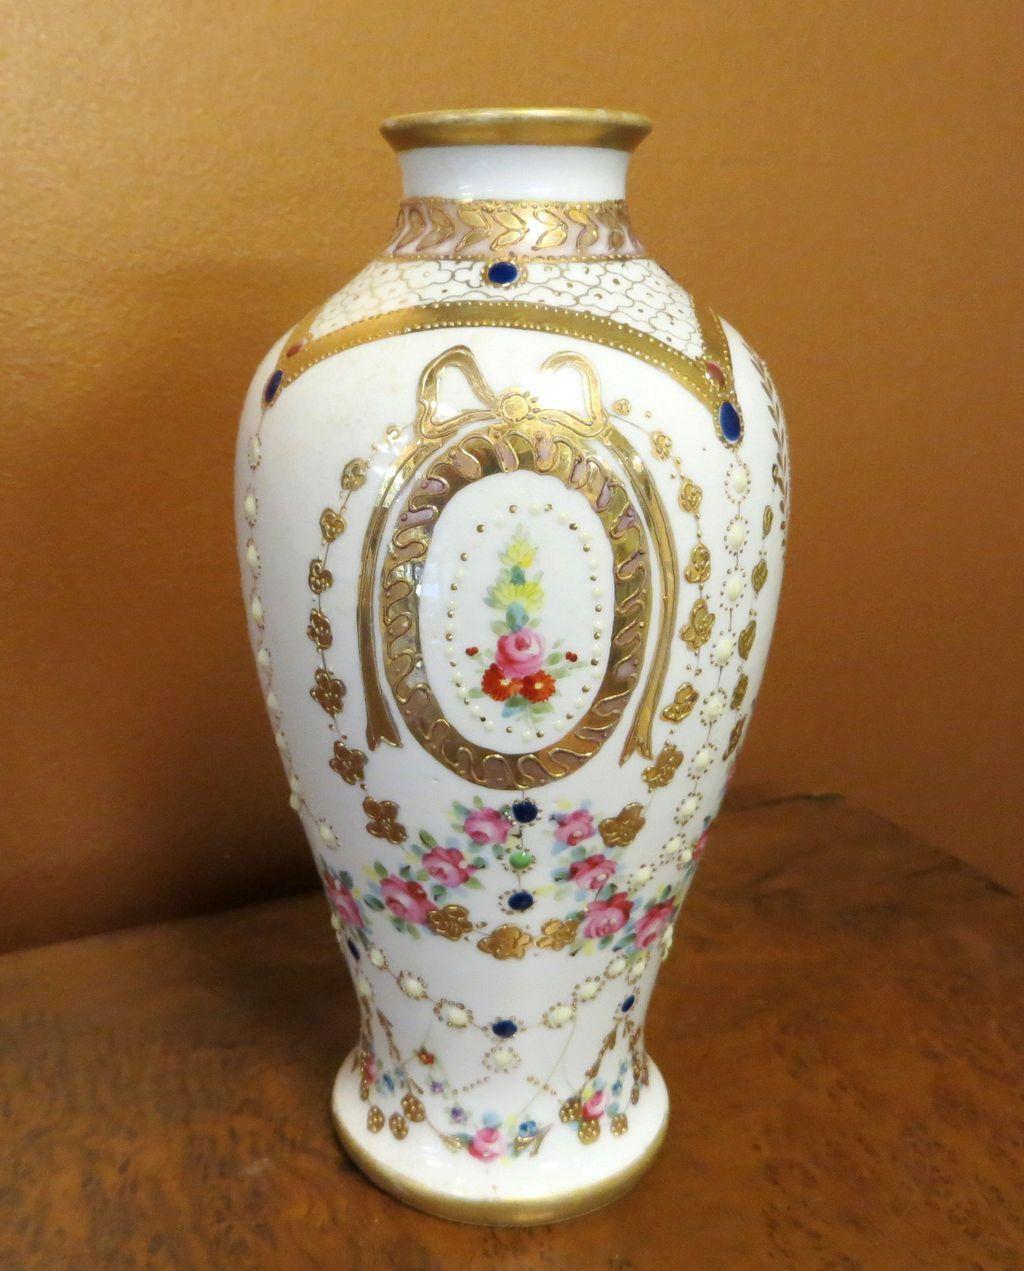 Ornate Circa 1920's Jeweled & Floral Enameled Nippon Vase